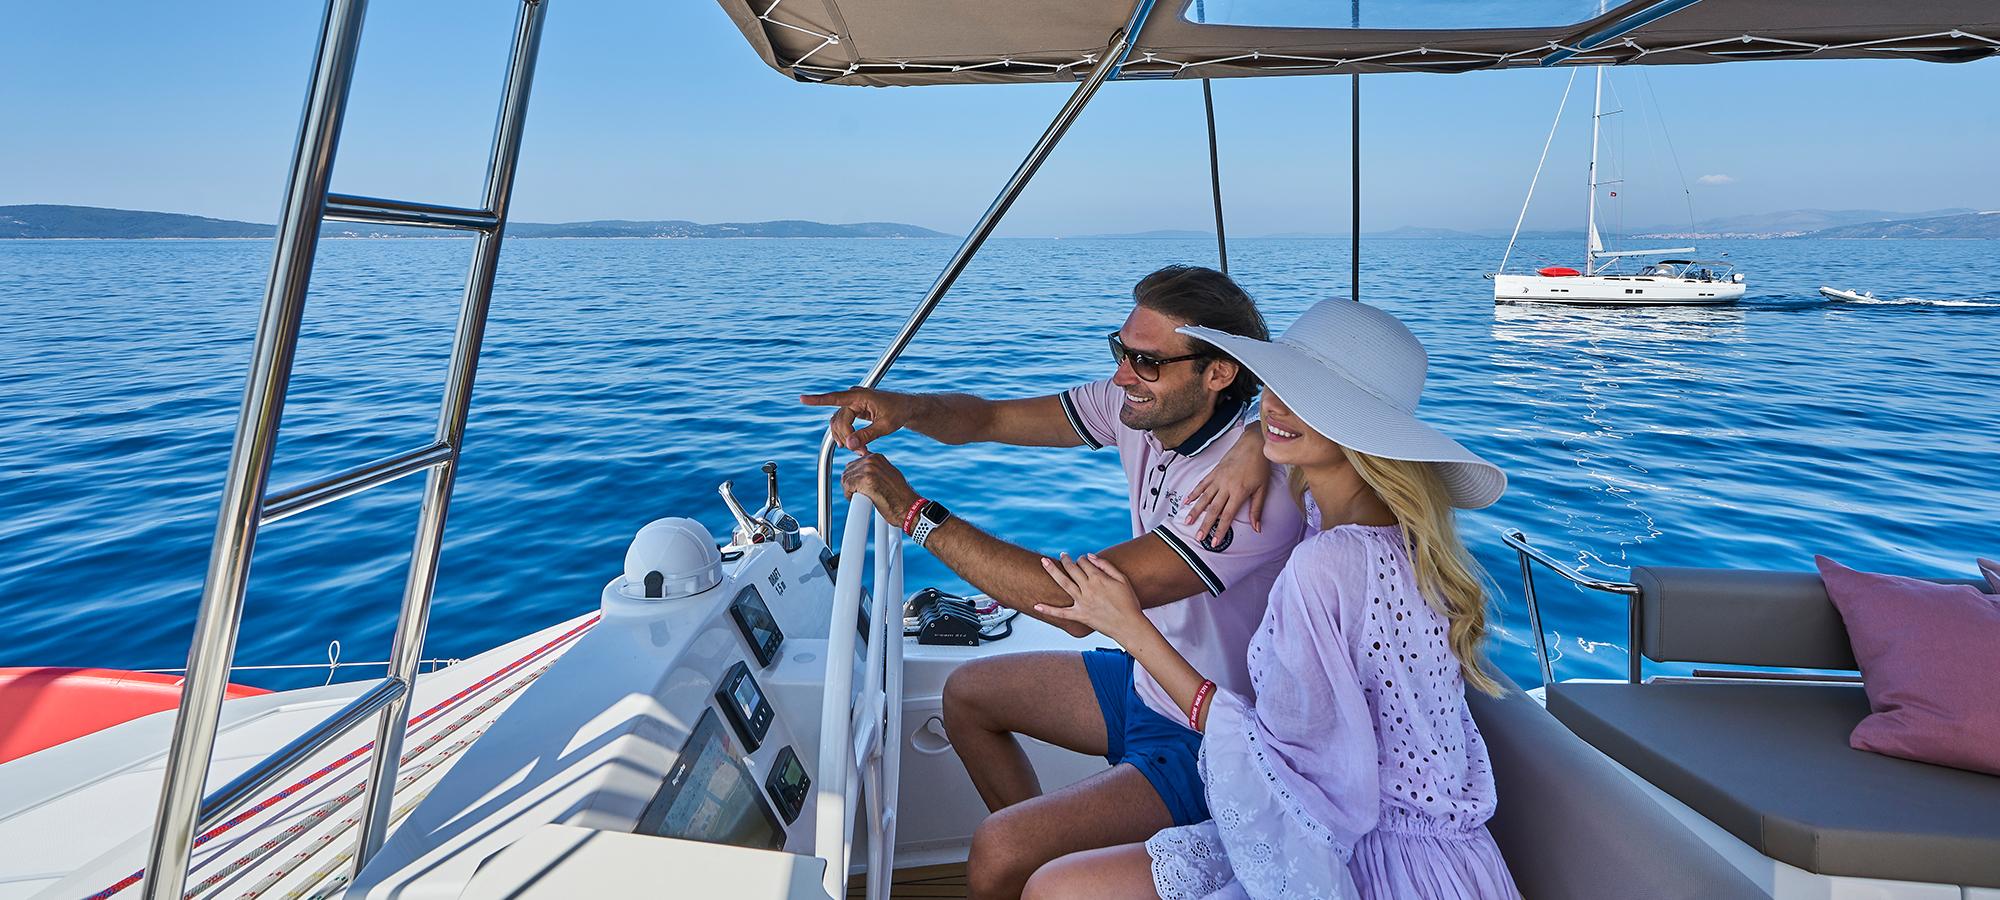 Yacht Charter Croatia: Charter Guide and FAQs